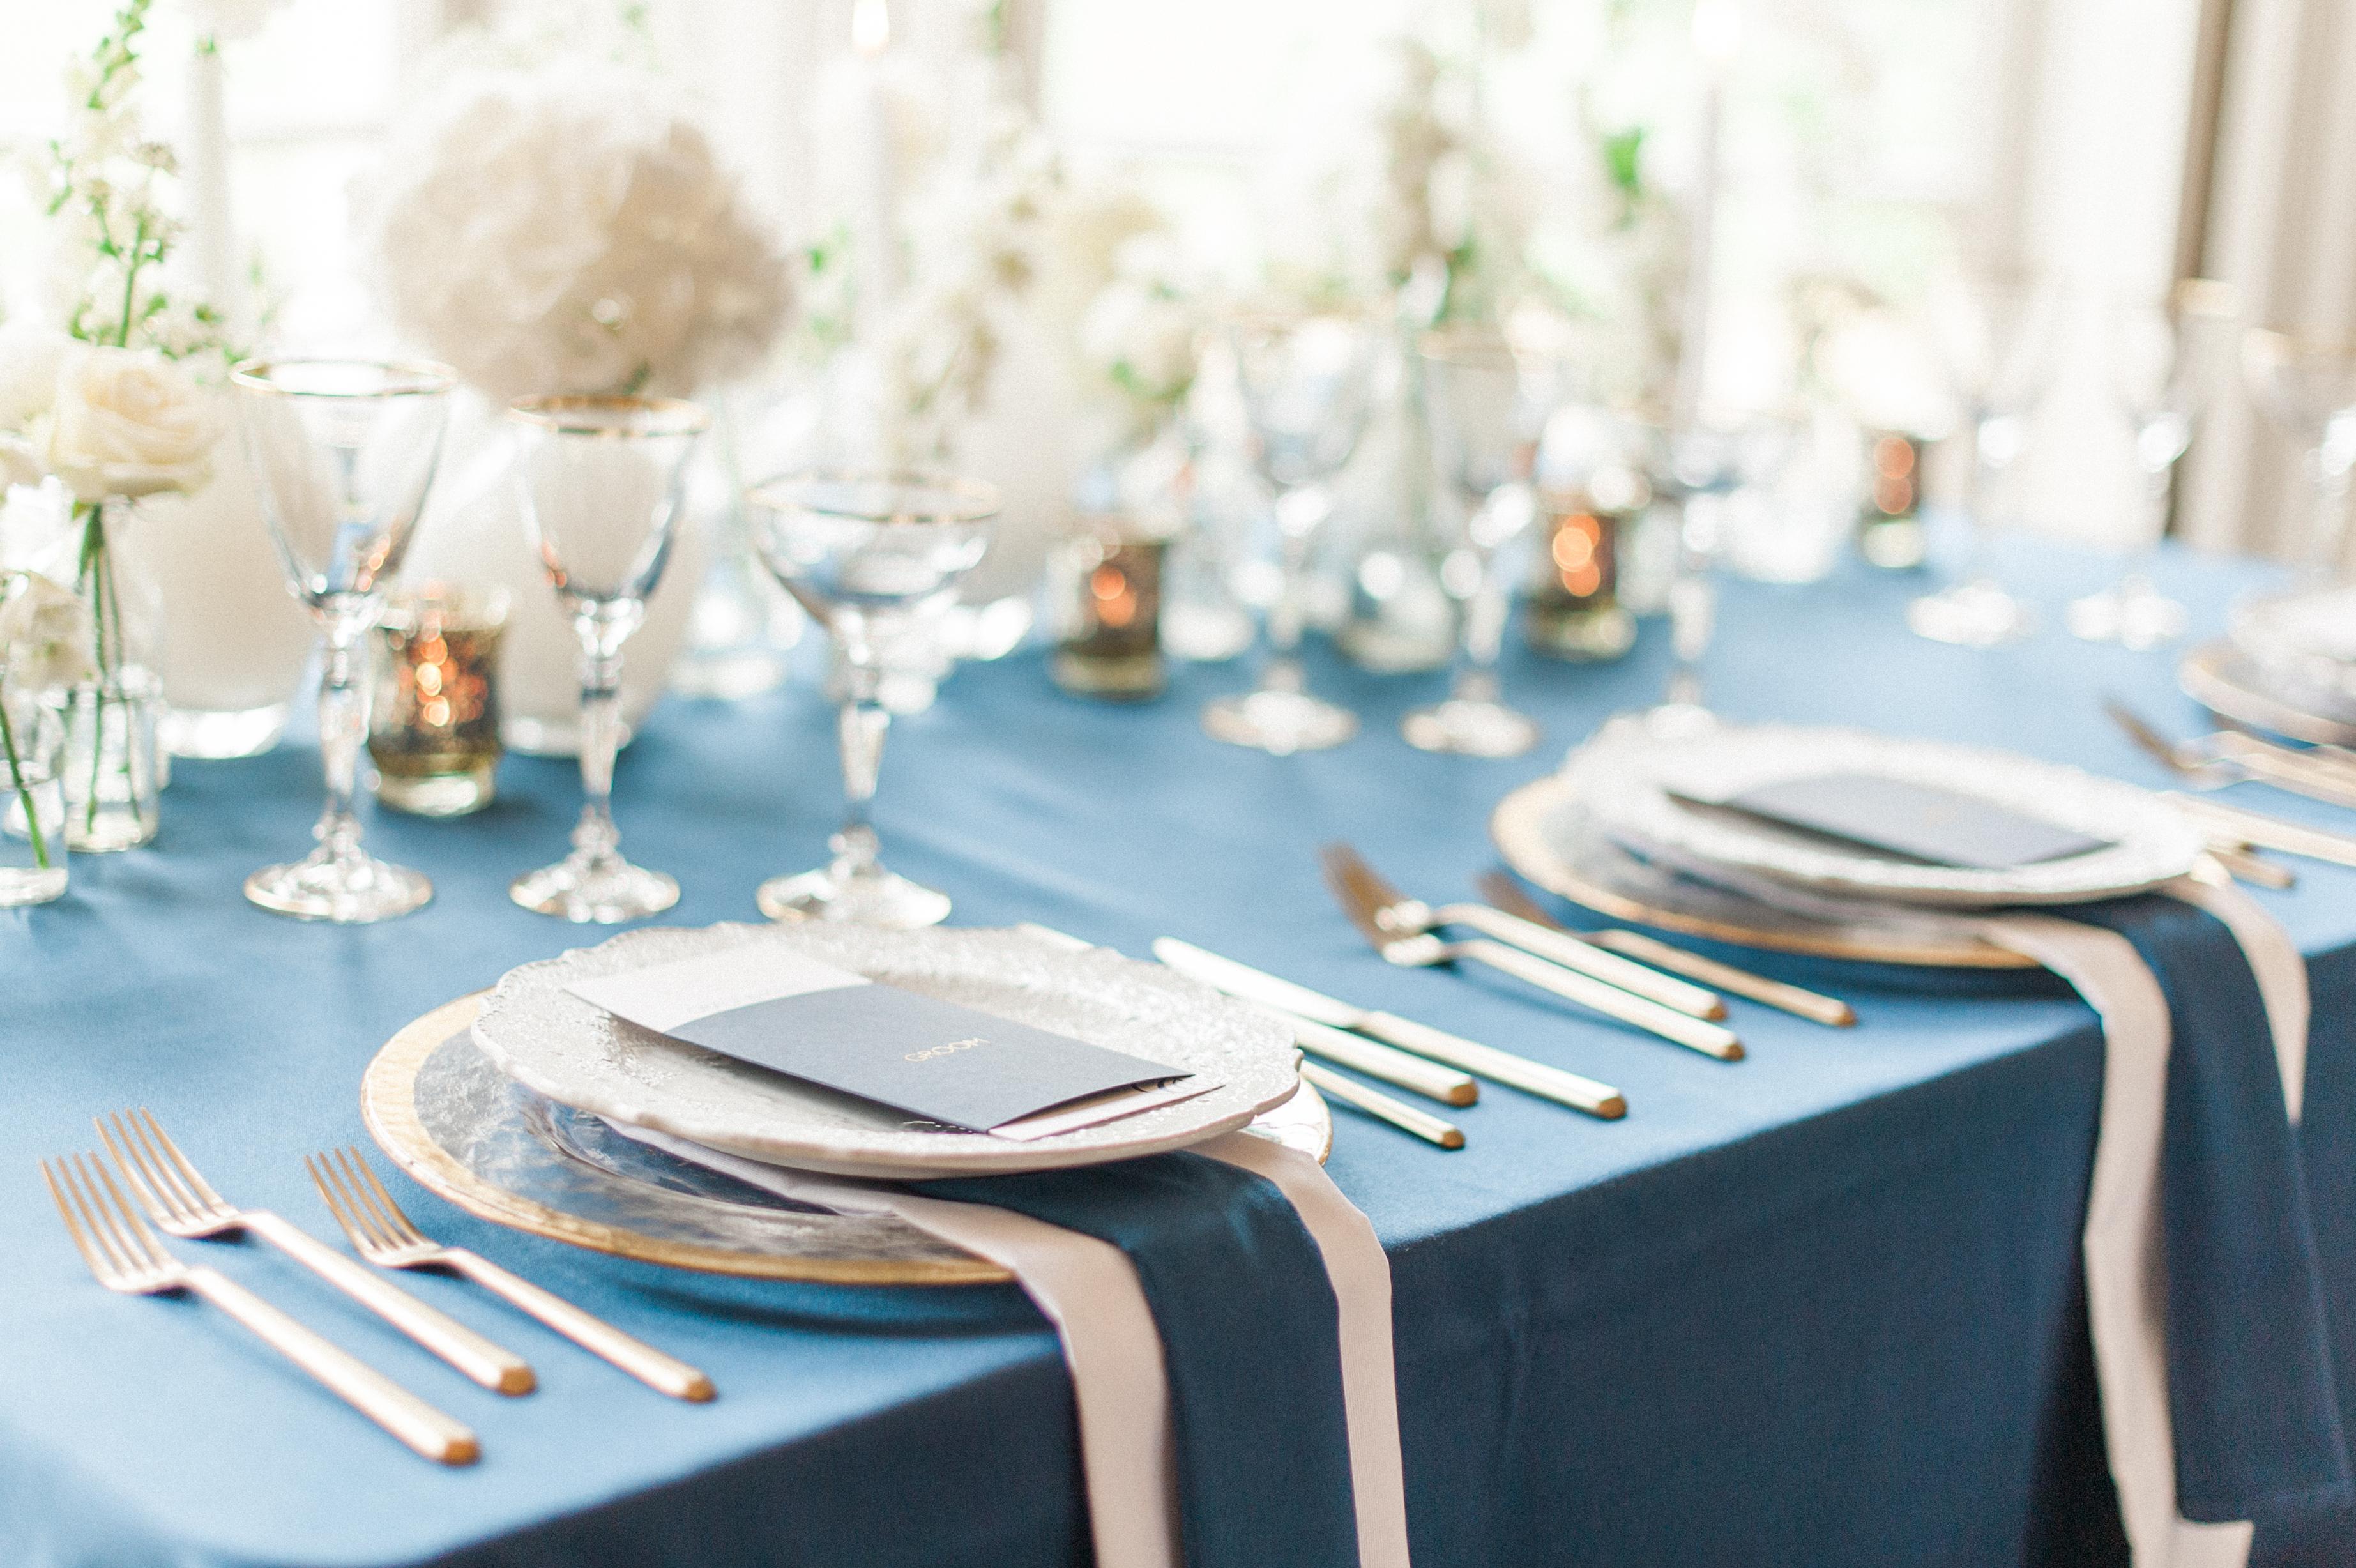 coronavirus cancelling wedding